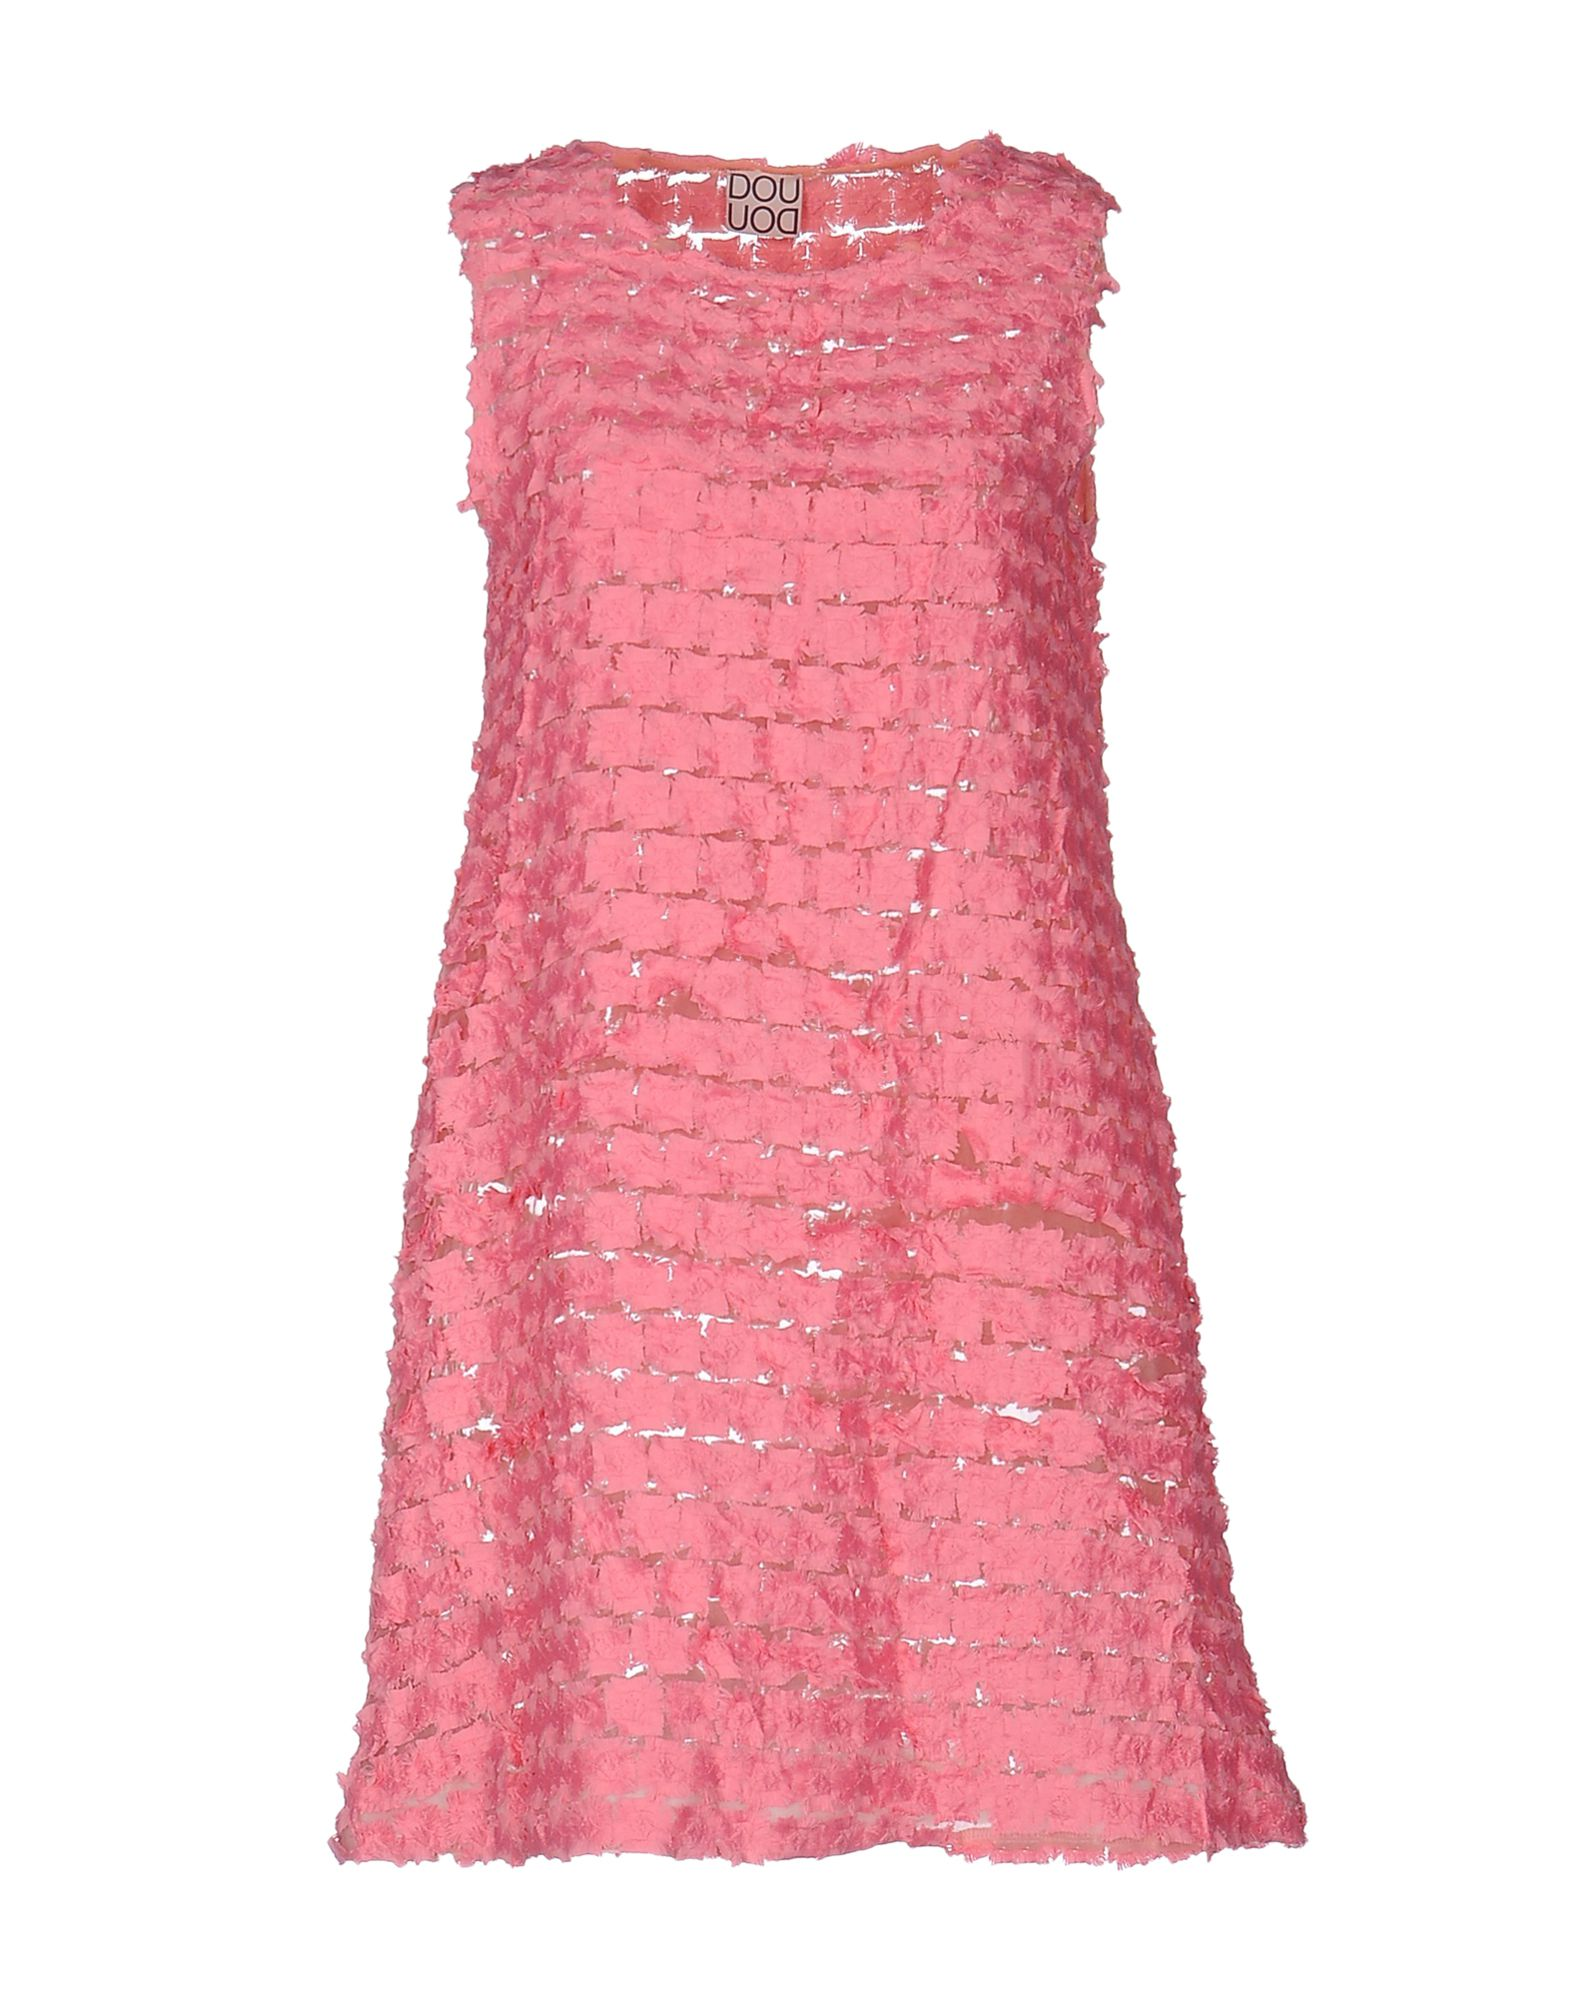 DOUUOD Short Dress in Pink